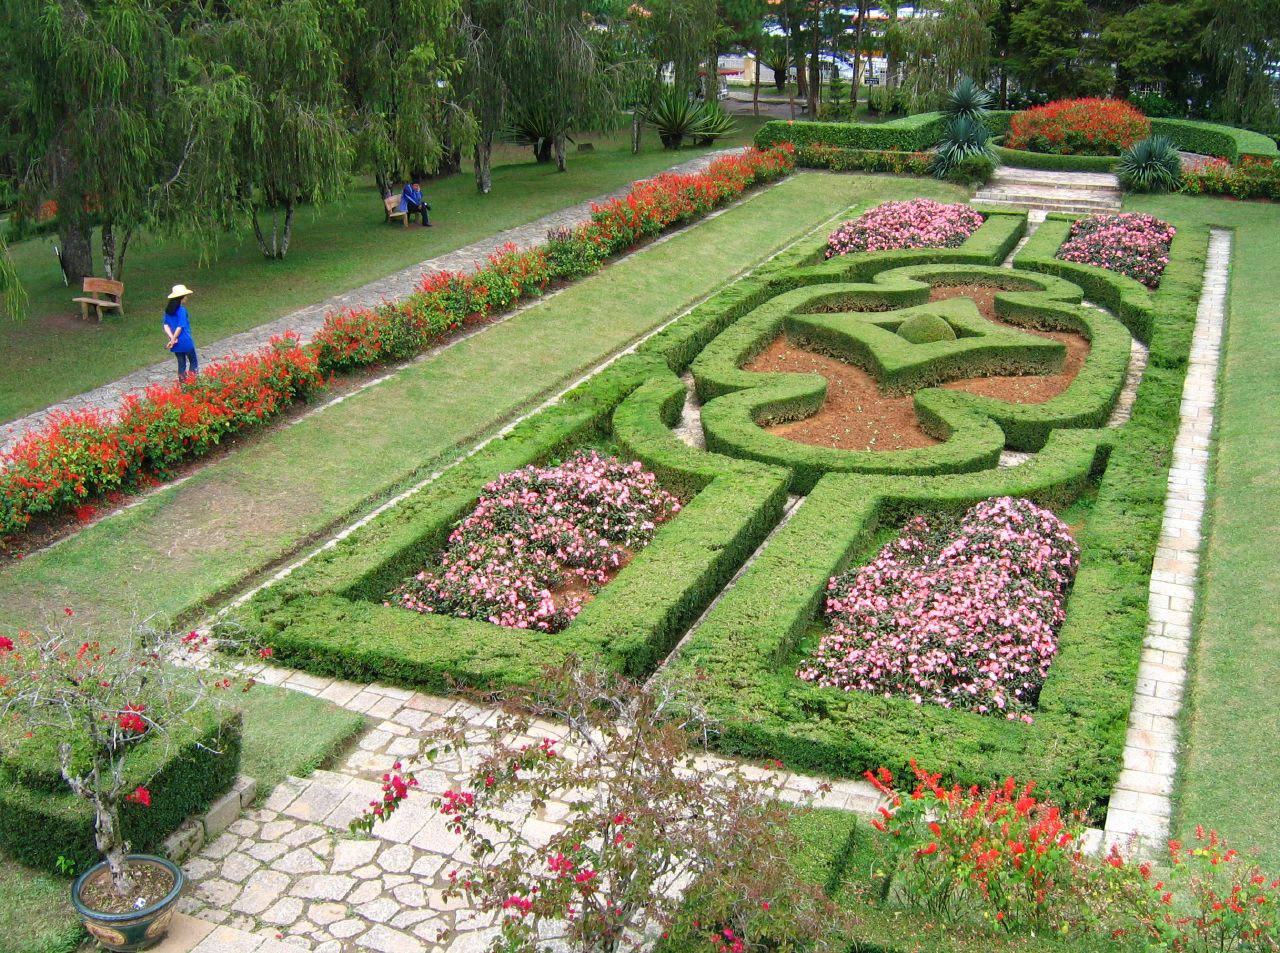 Виллы Бао Дая, французский парк